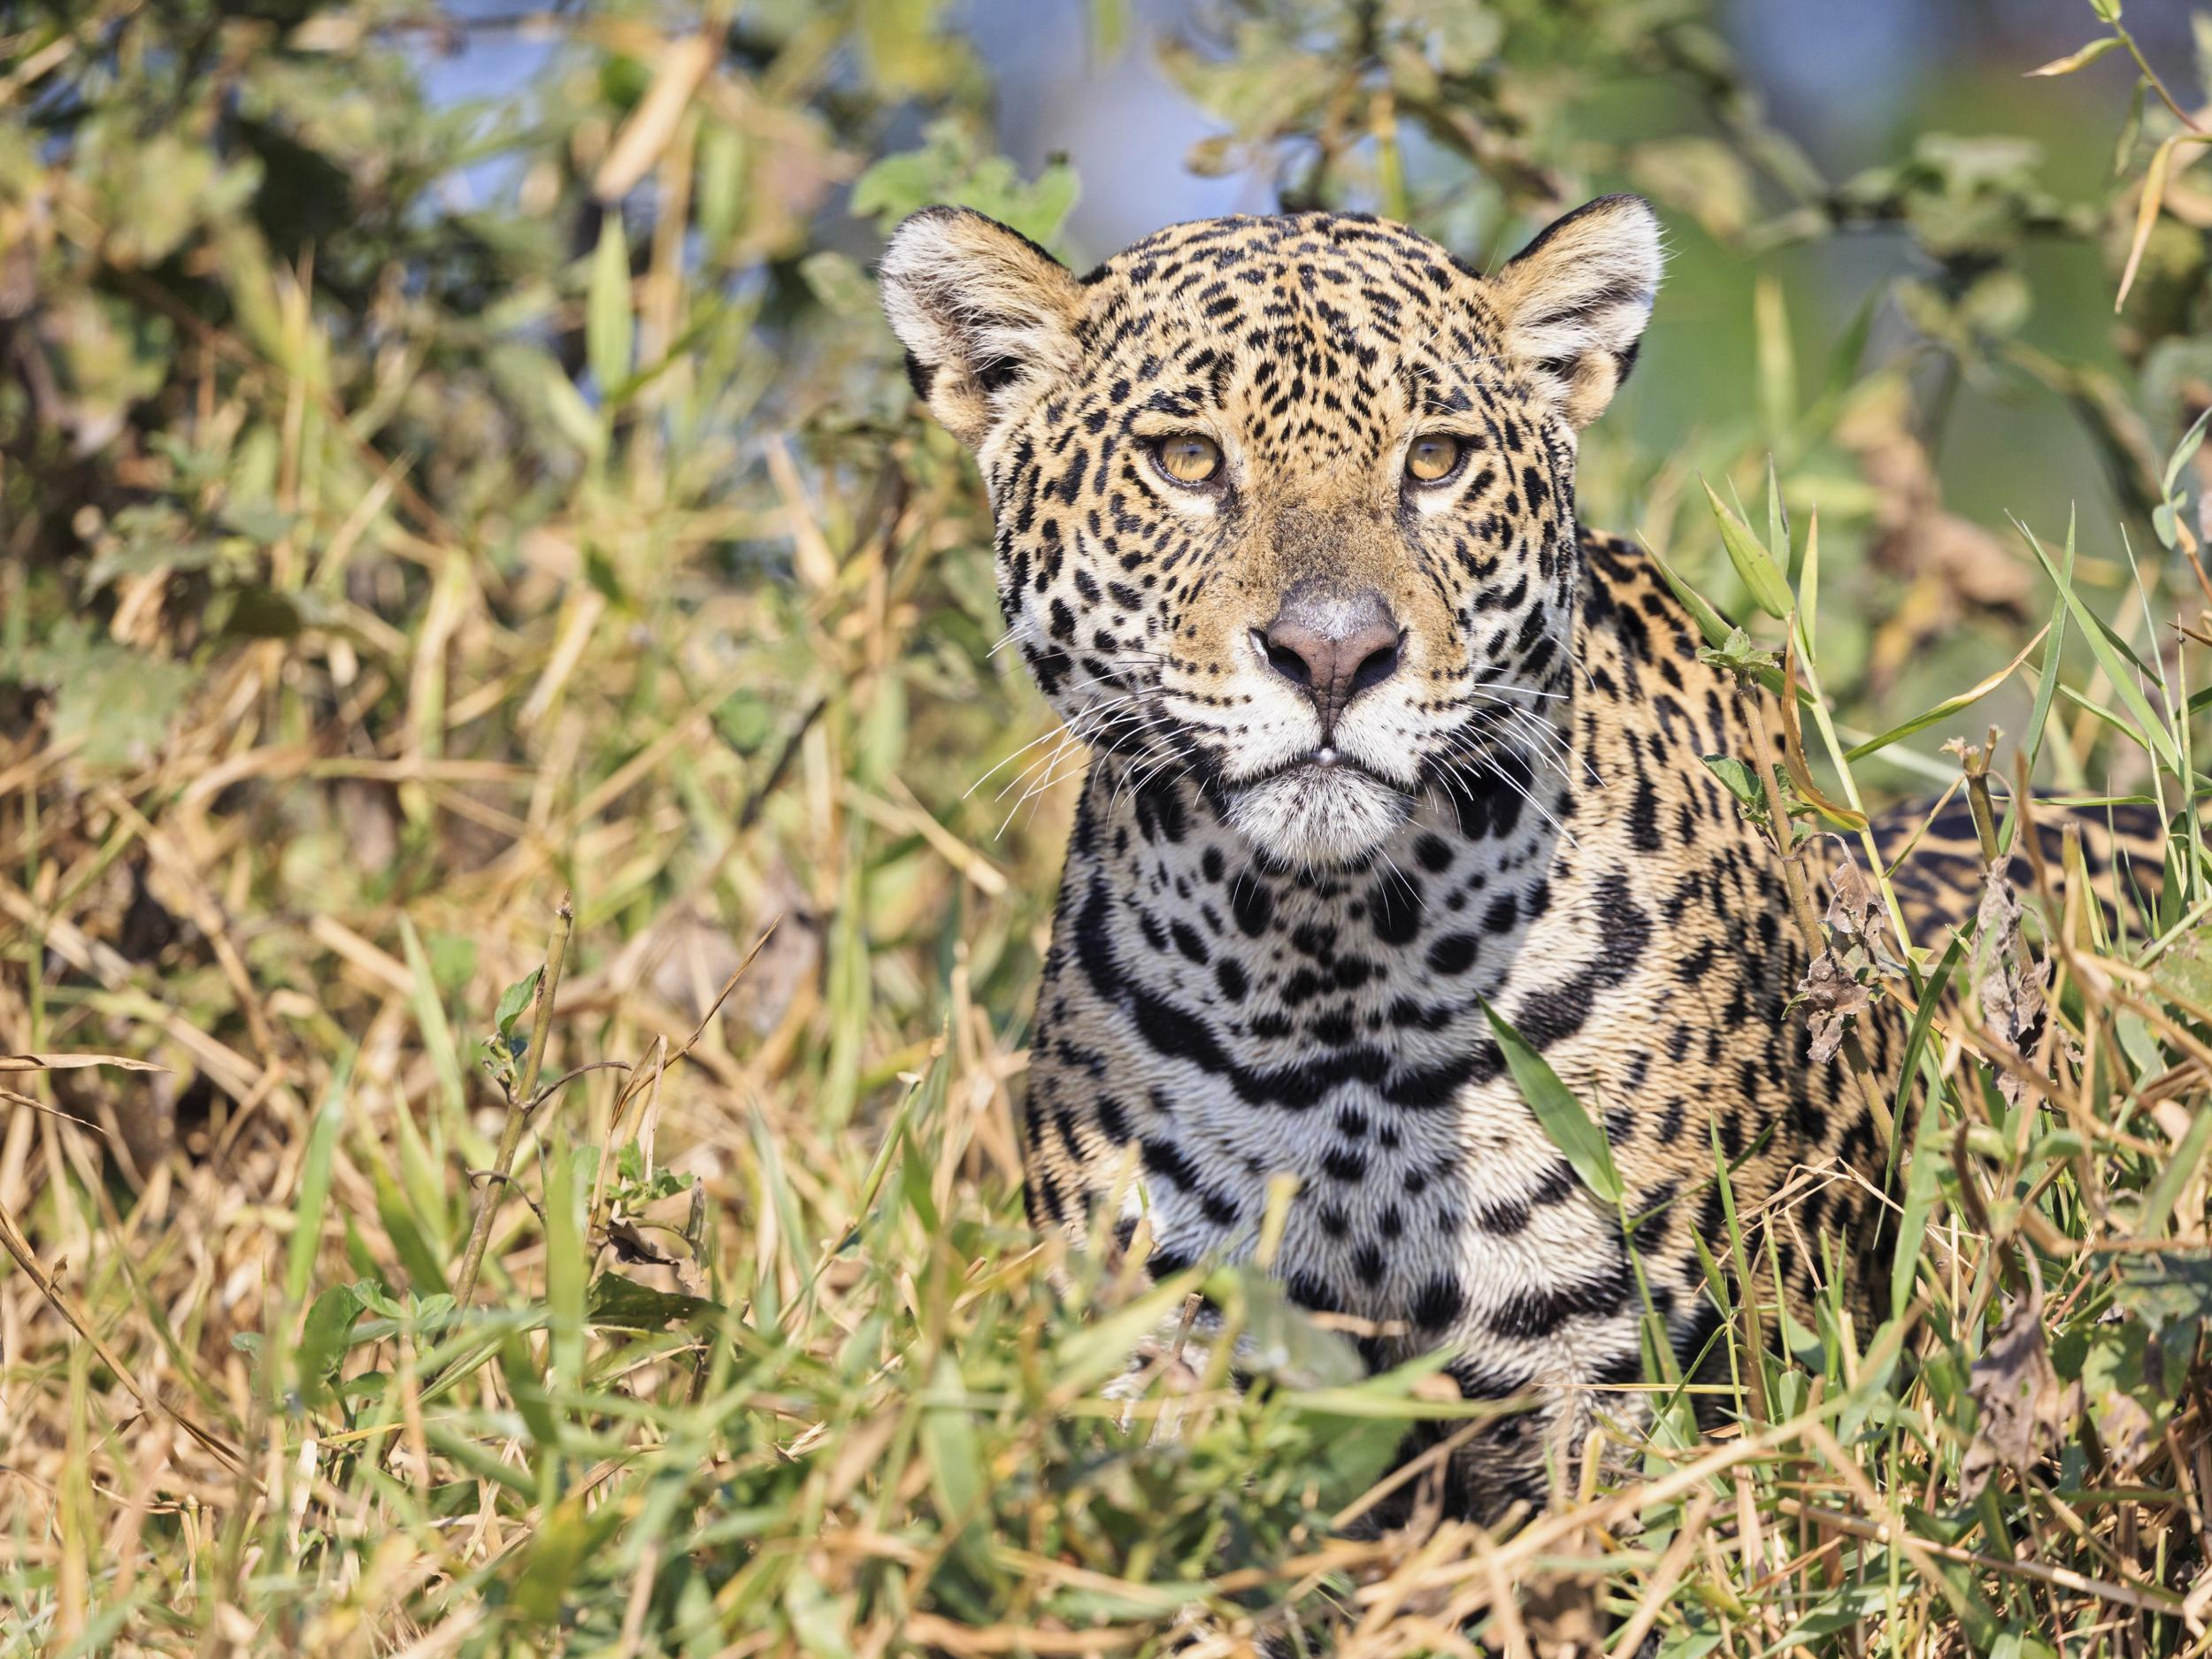 Jaguar >> Jaguar Escapes Enclosure At New Orleans Zoo And Goes On Killing